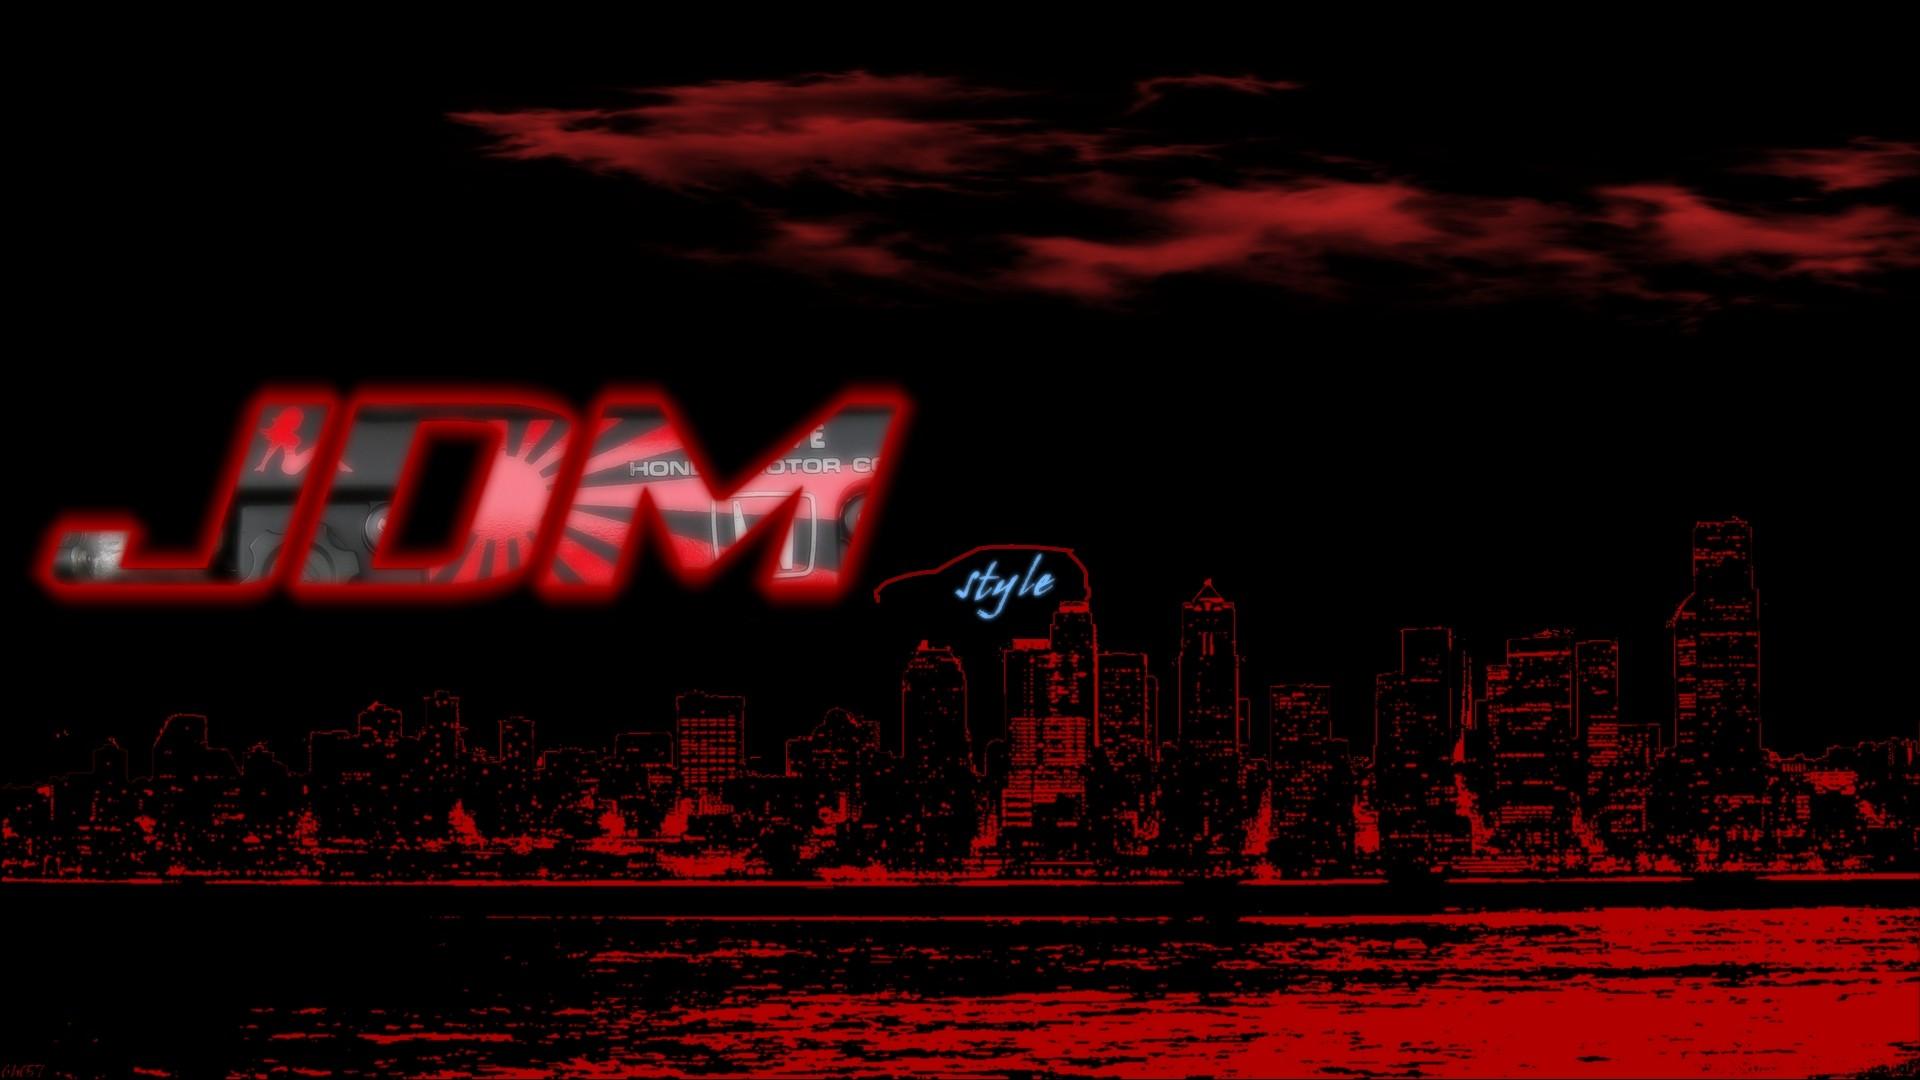 Japan illustration red text jdm honda civic poster brand darkness screenshot 1920x1080 px computer wallpaper font